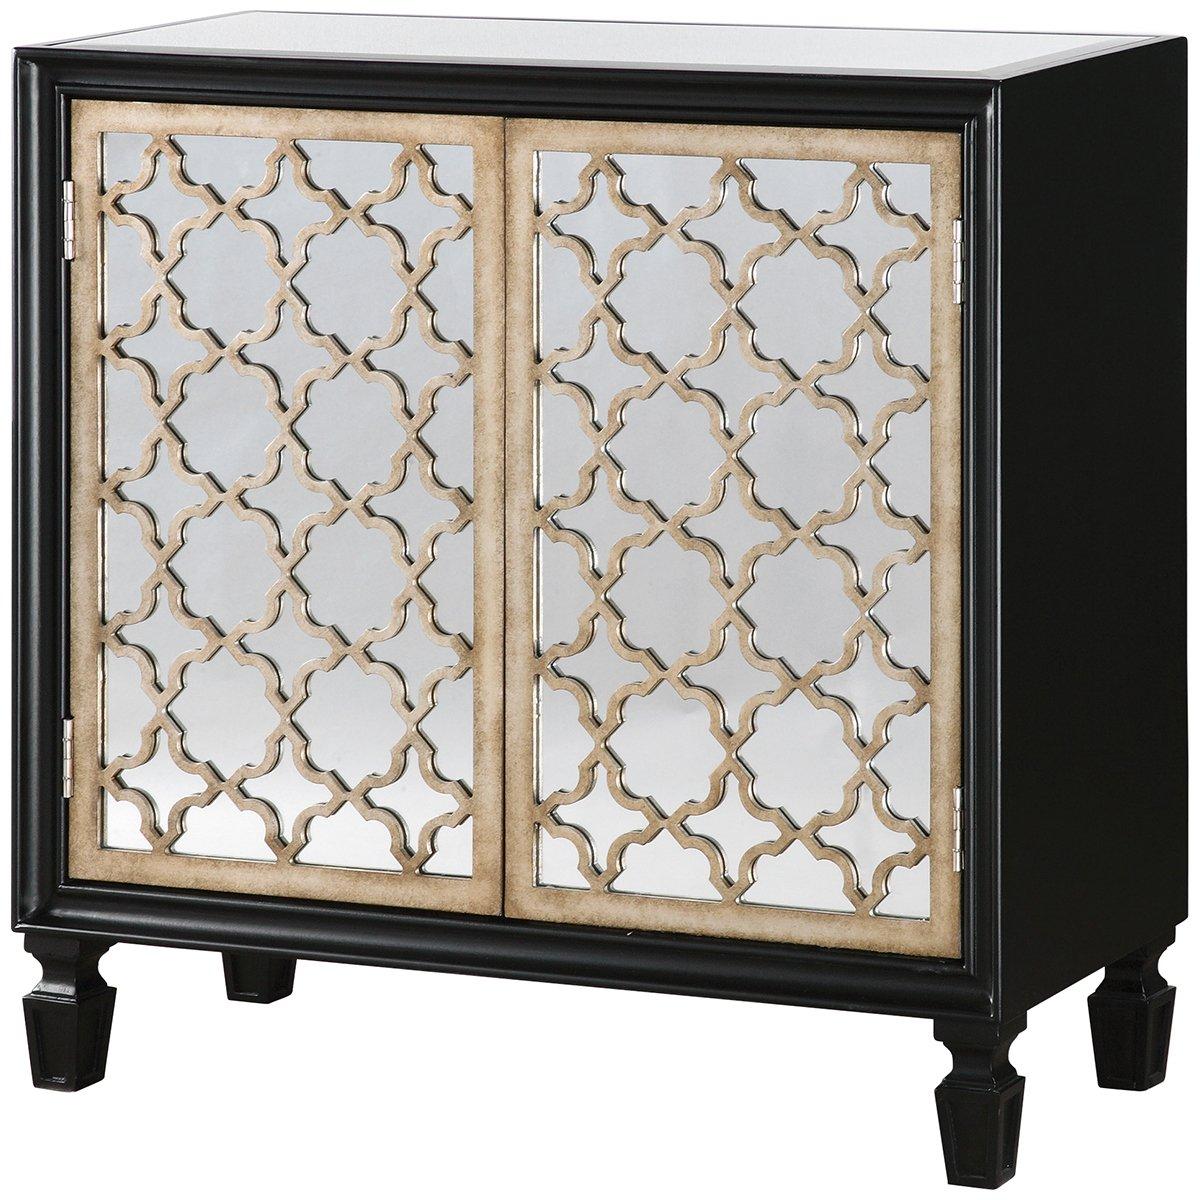 Superieur Amazon.com: Uttermost 24498 Franzea Mirrored Console Cabinet: Kitchen U0026  Dining